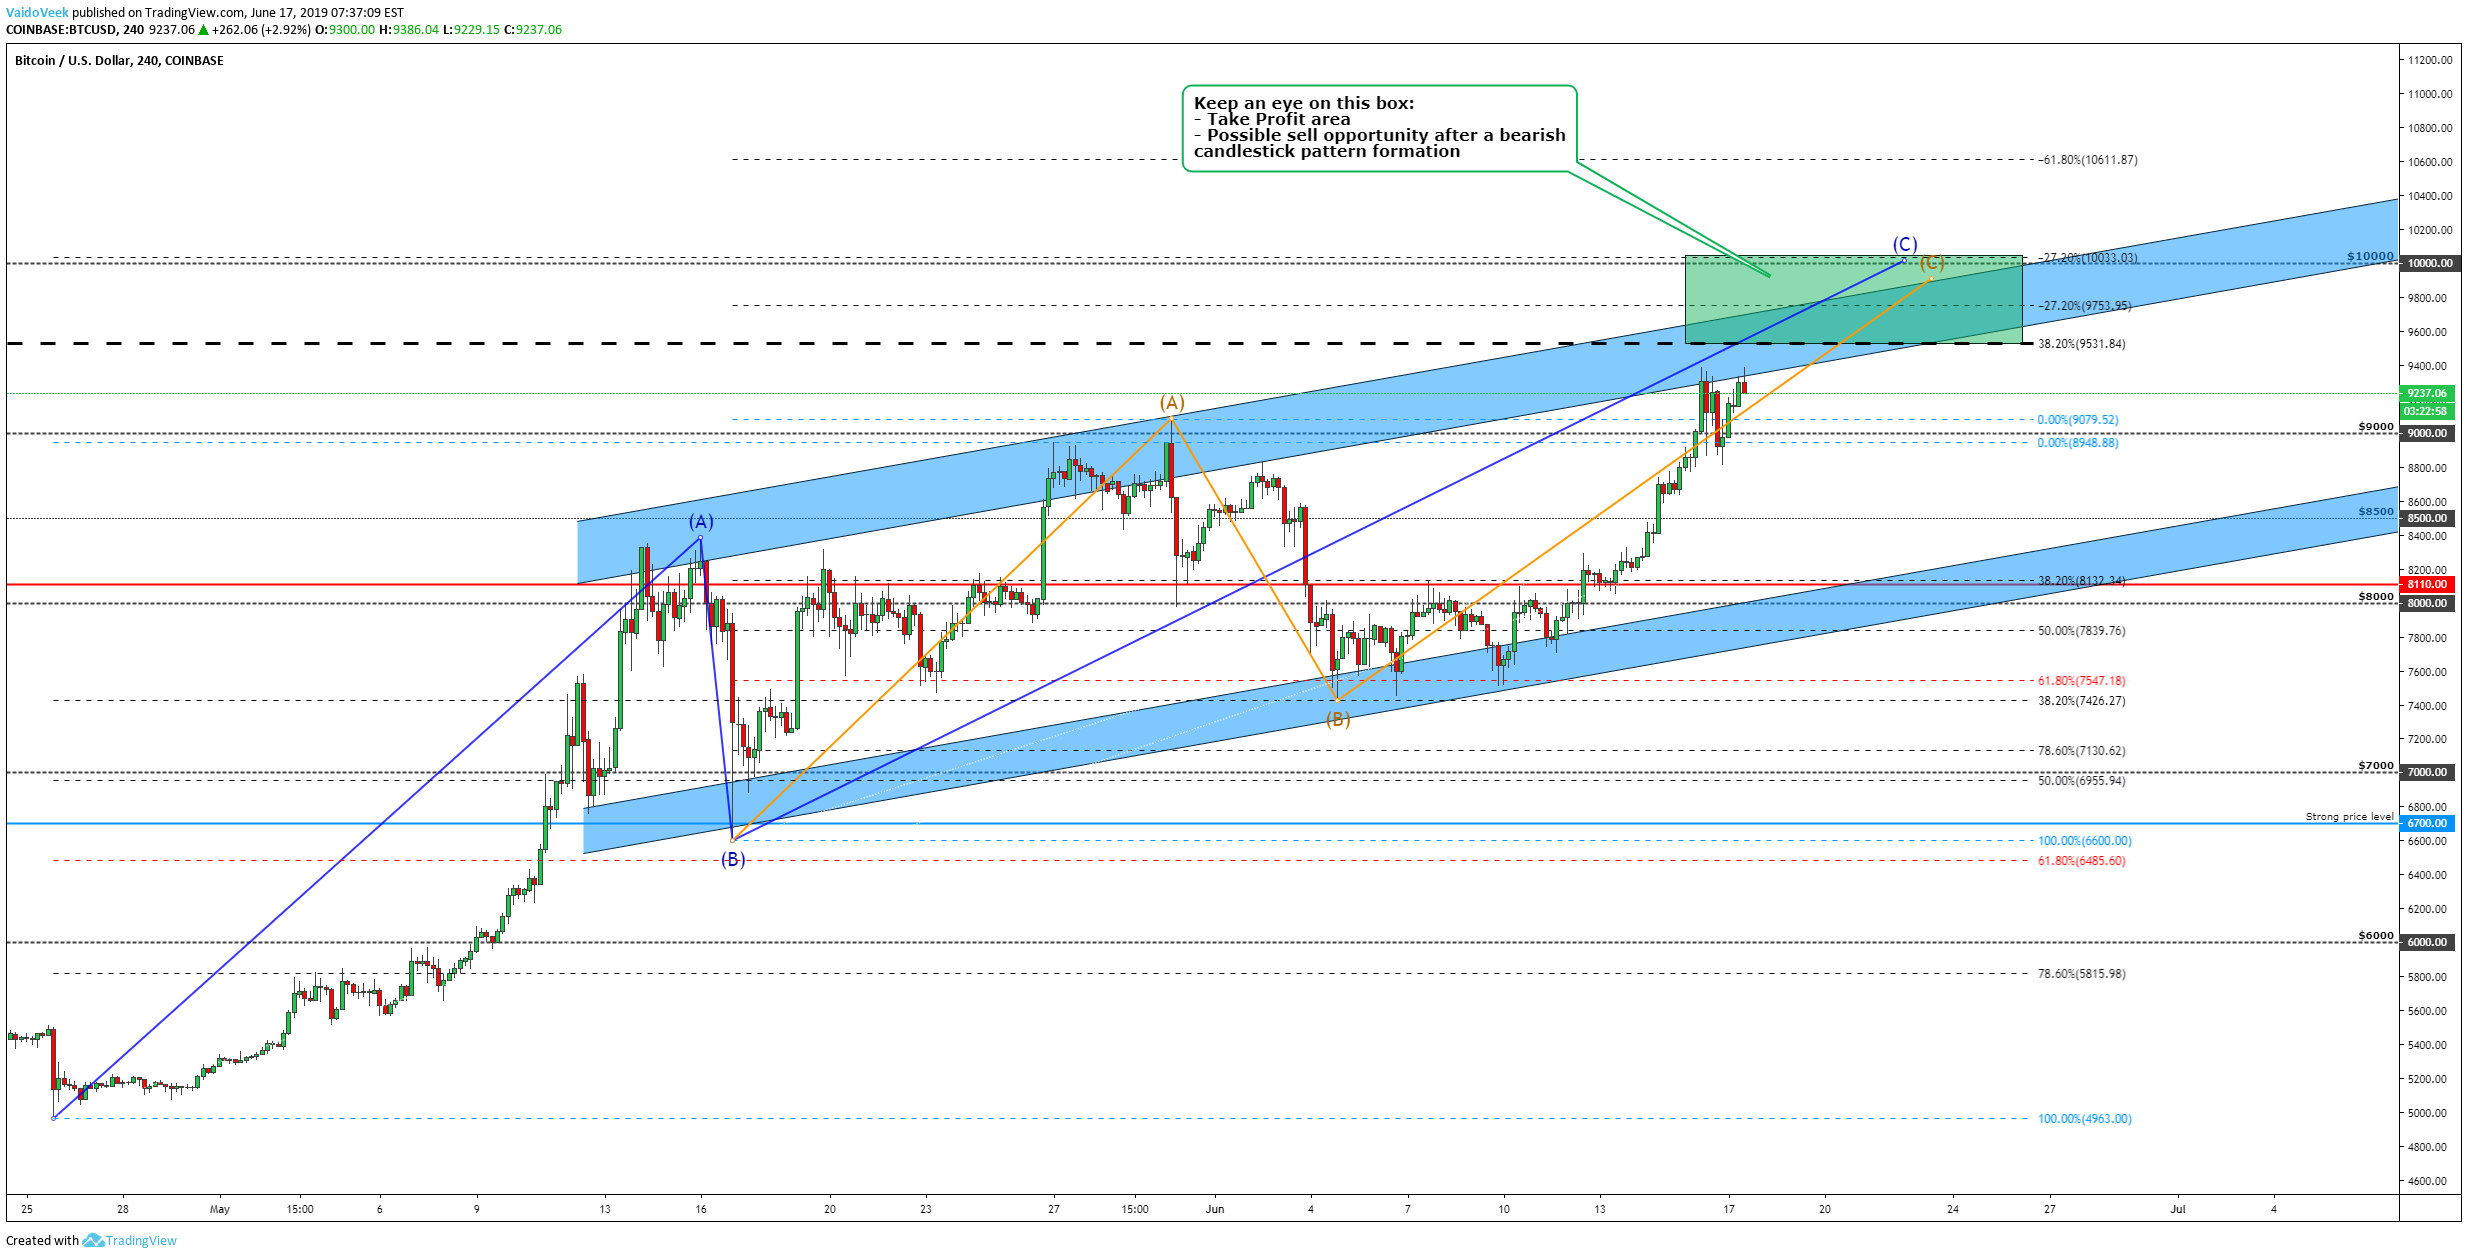 BTC/USD, Technical analysis.